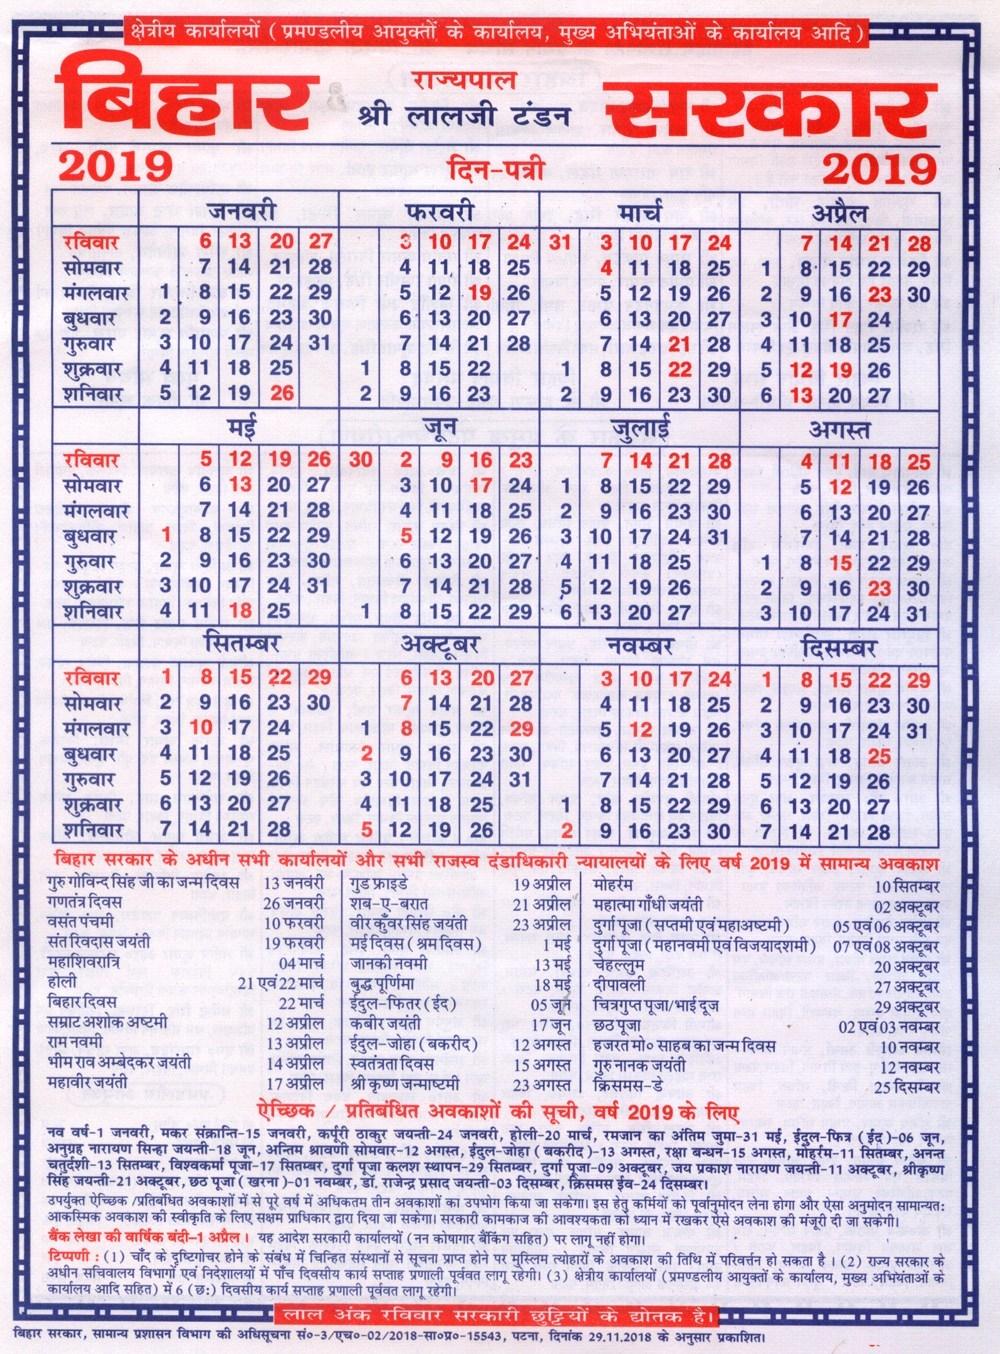 Bihar_Government_Calendar2019 | Bihar School intended for Bihar Calendar 2020